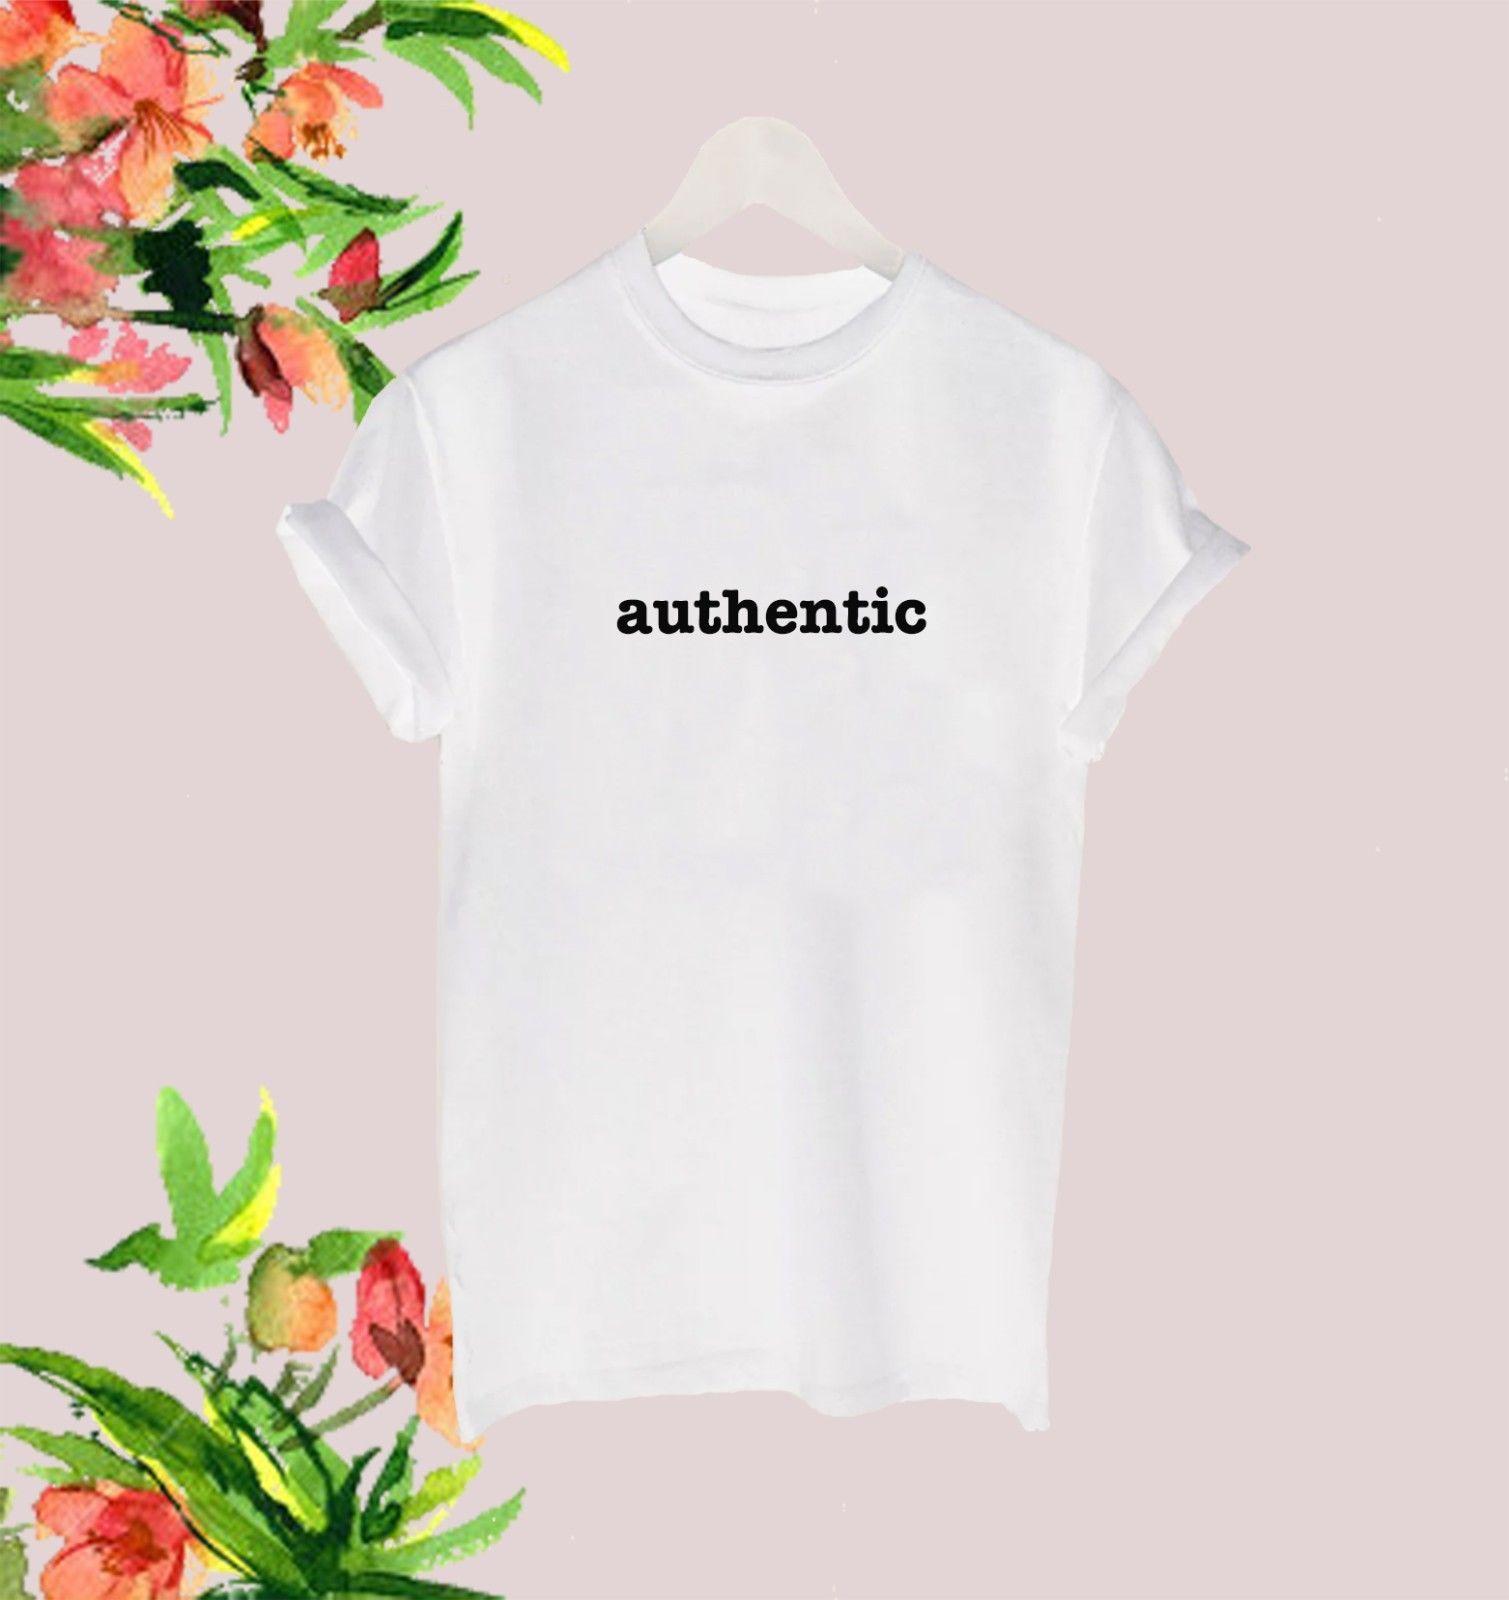 AUTHENTIC LADIES men WOMENS SLOGAN WHITE BLACK T SHIRT TEE TSHIRT GIFT 90S STYLEFashion Design Free Shipping  Mens Shirts